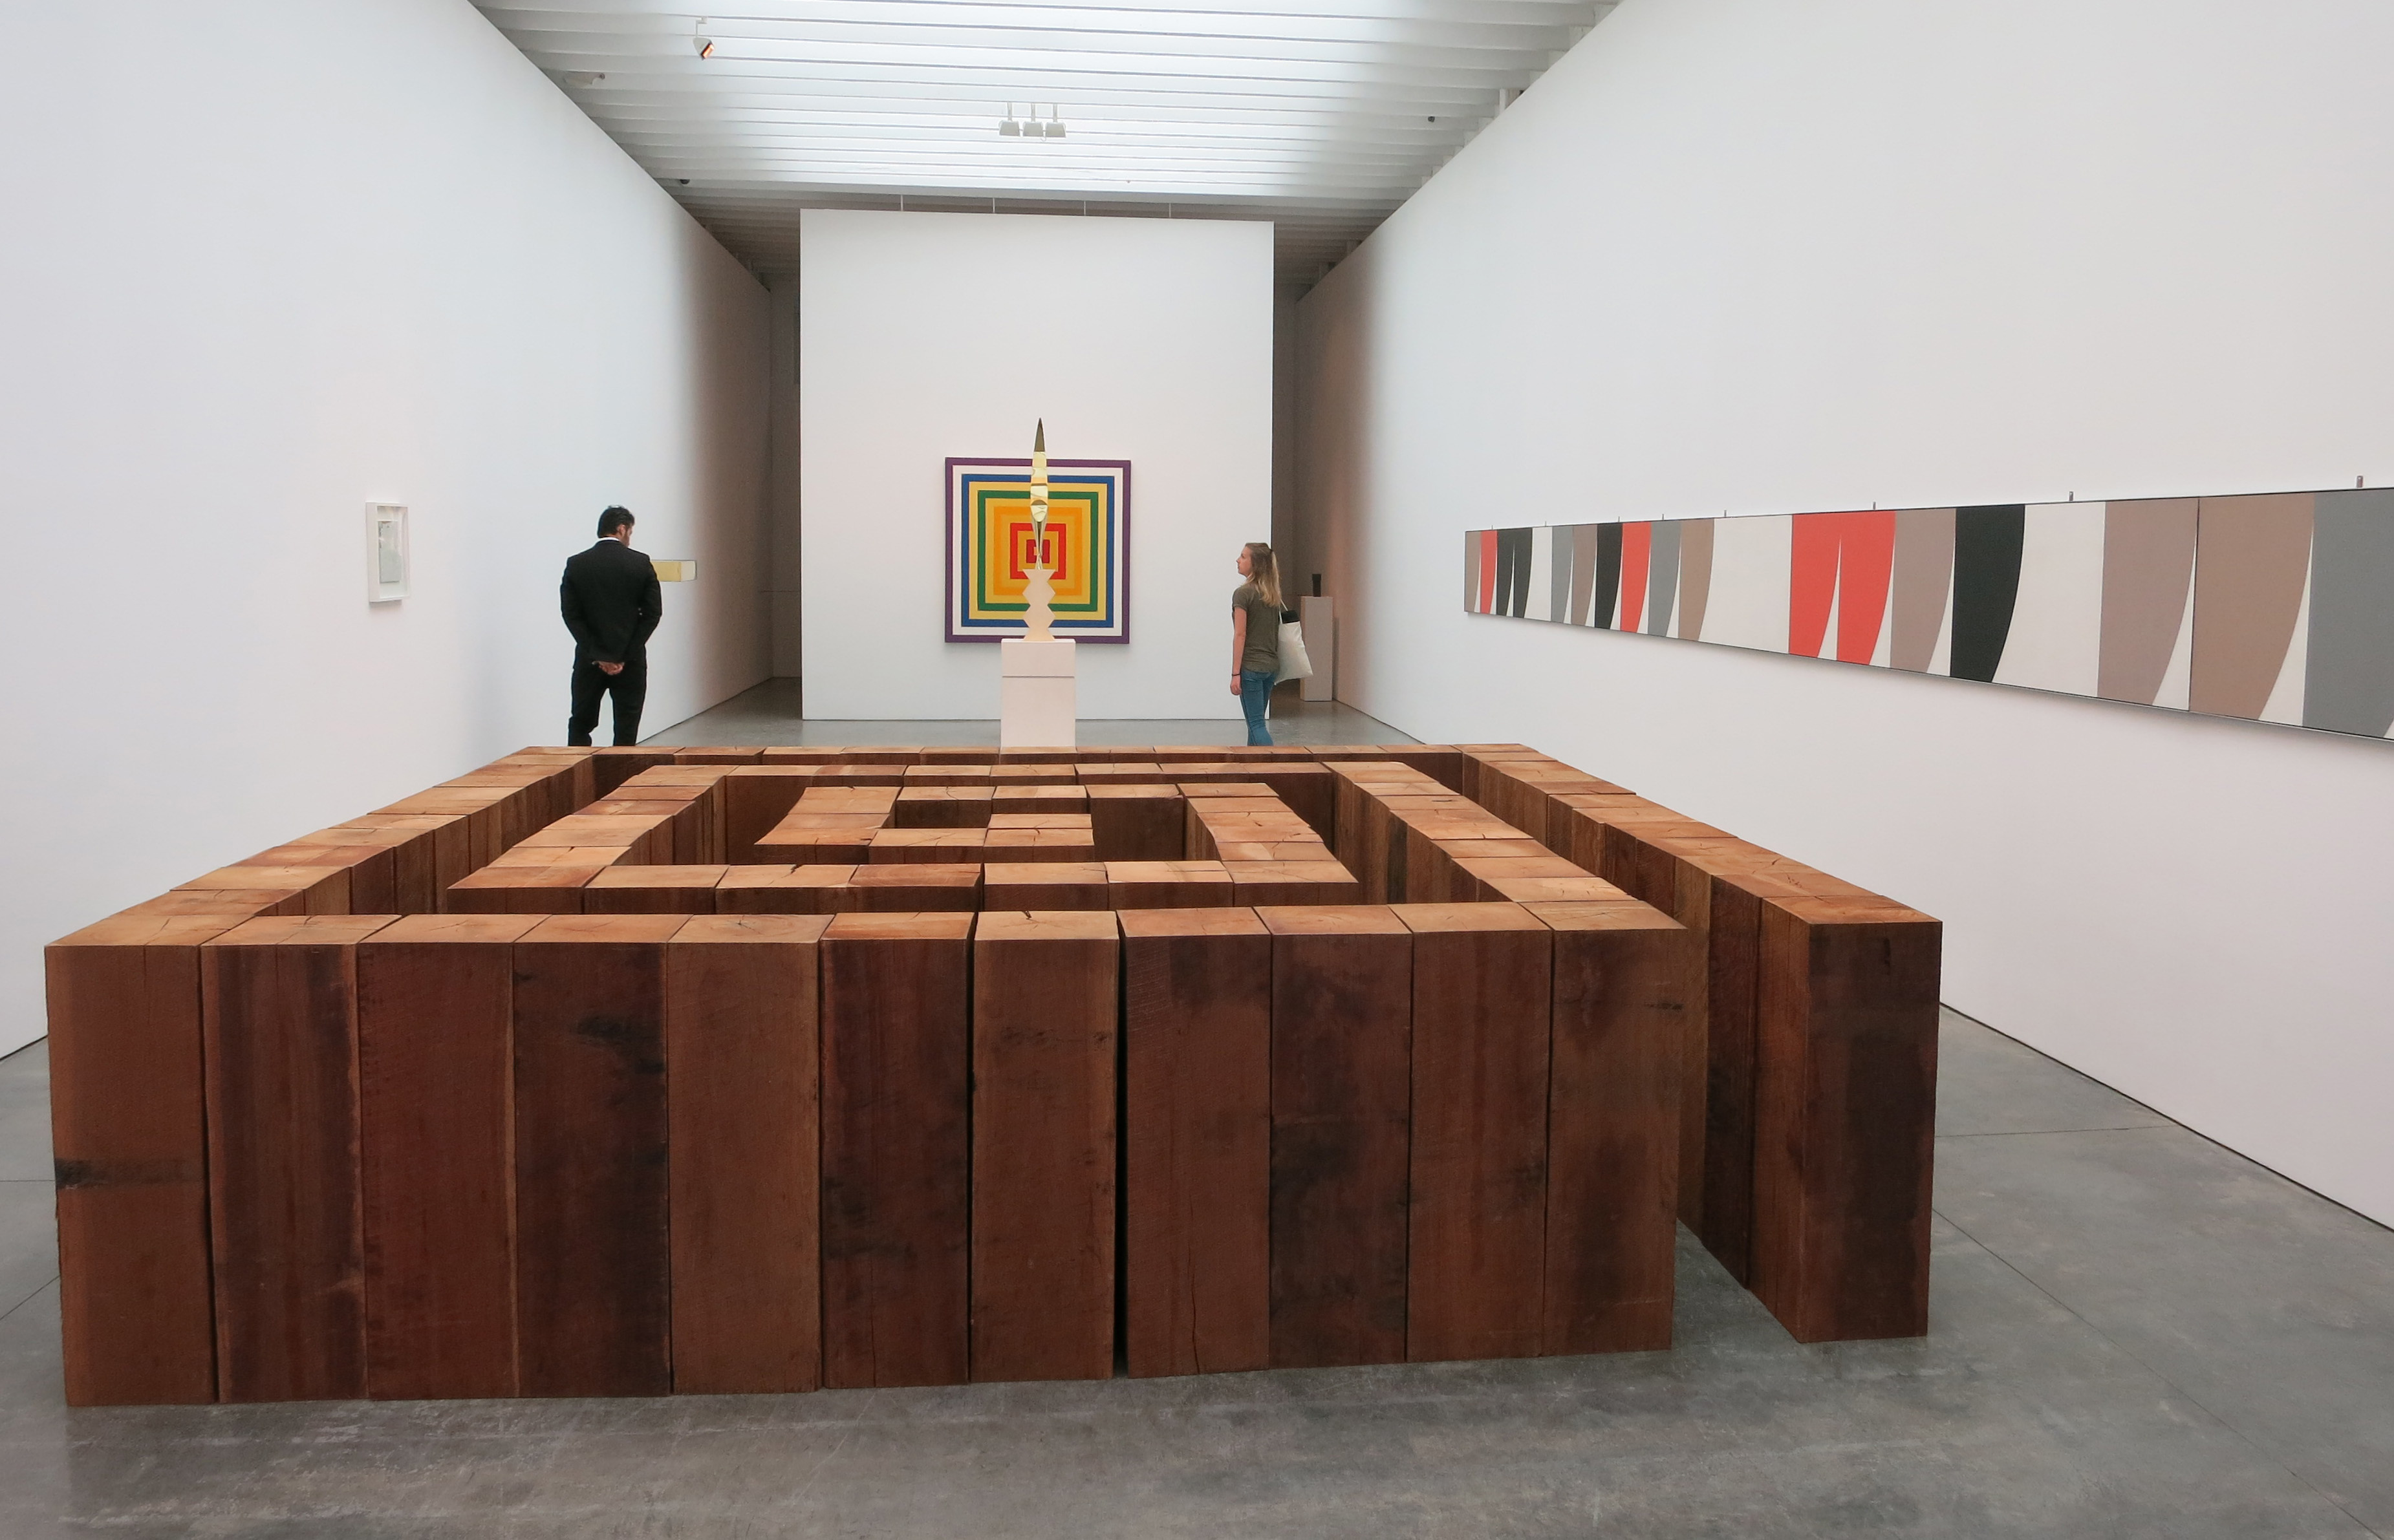 Carl andre new york art tours for Minimal art gallery